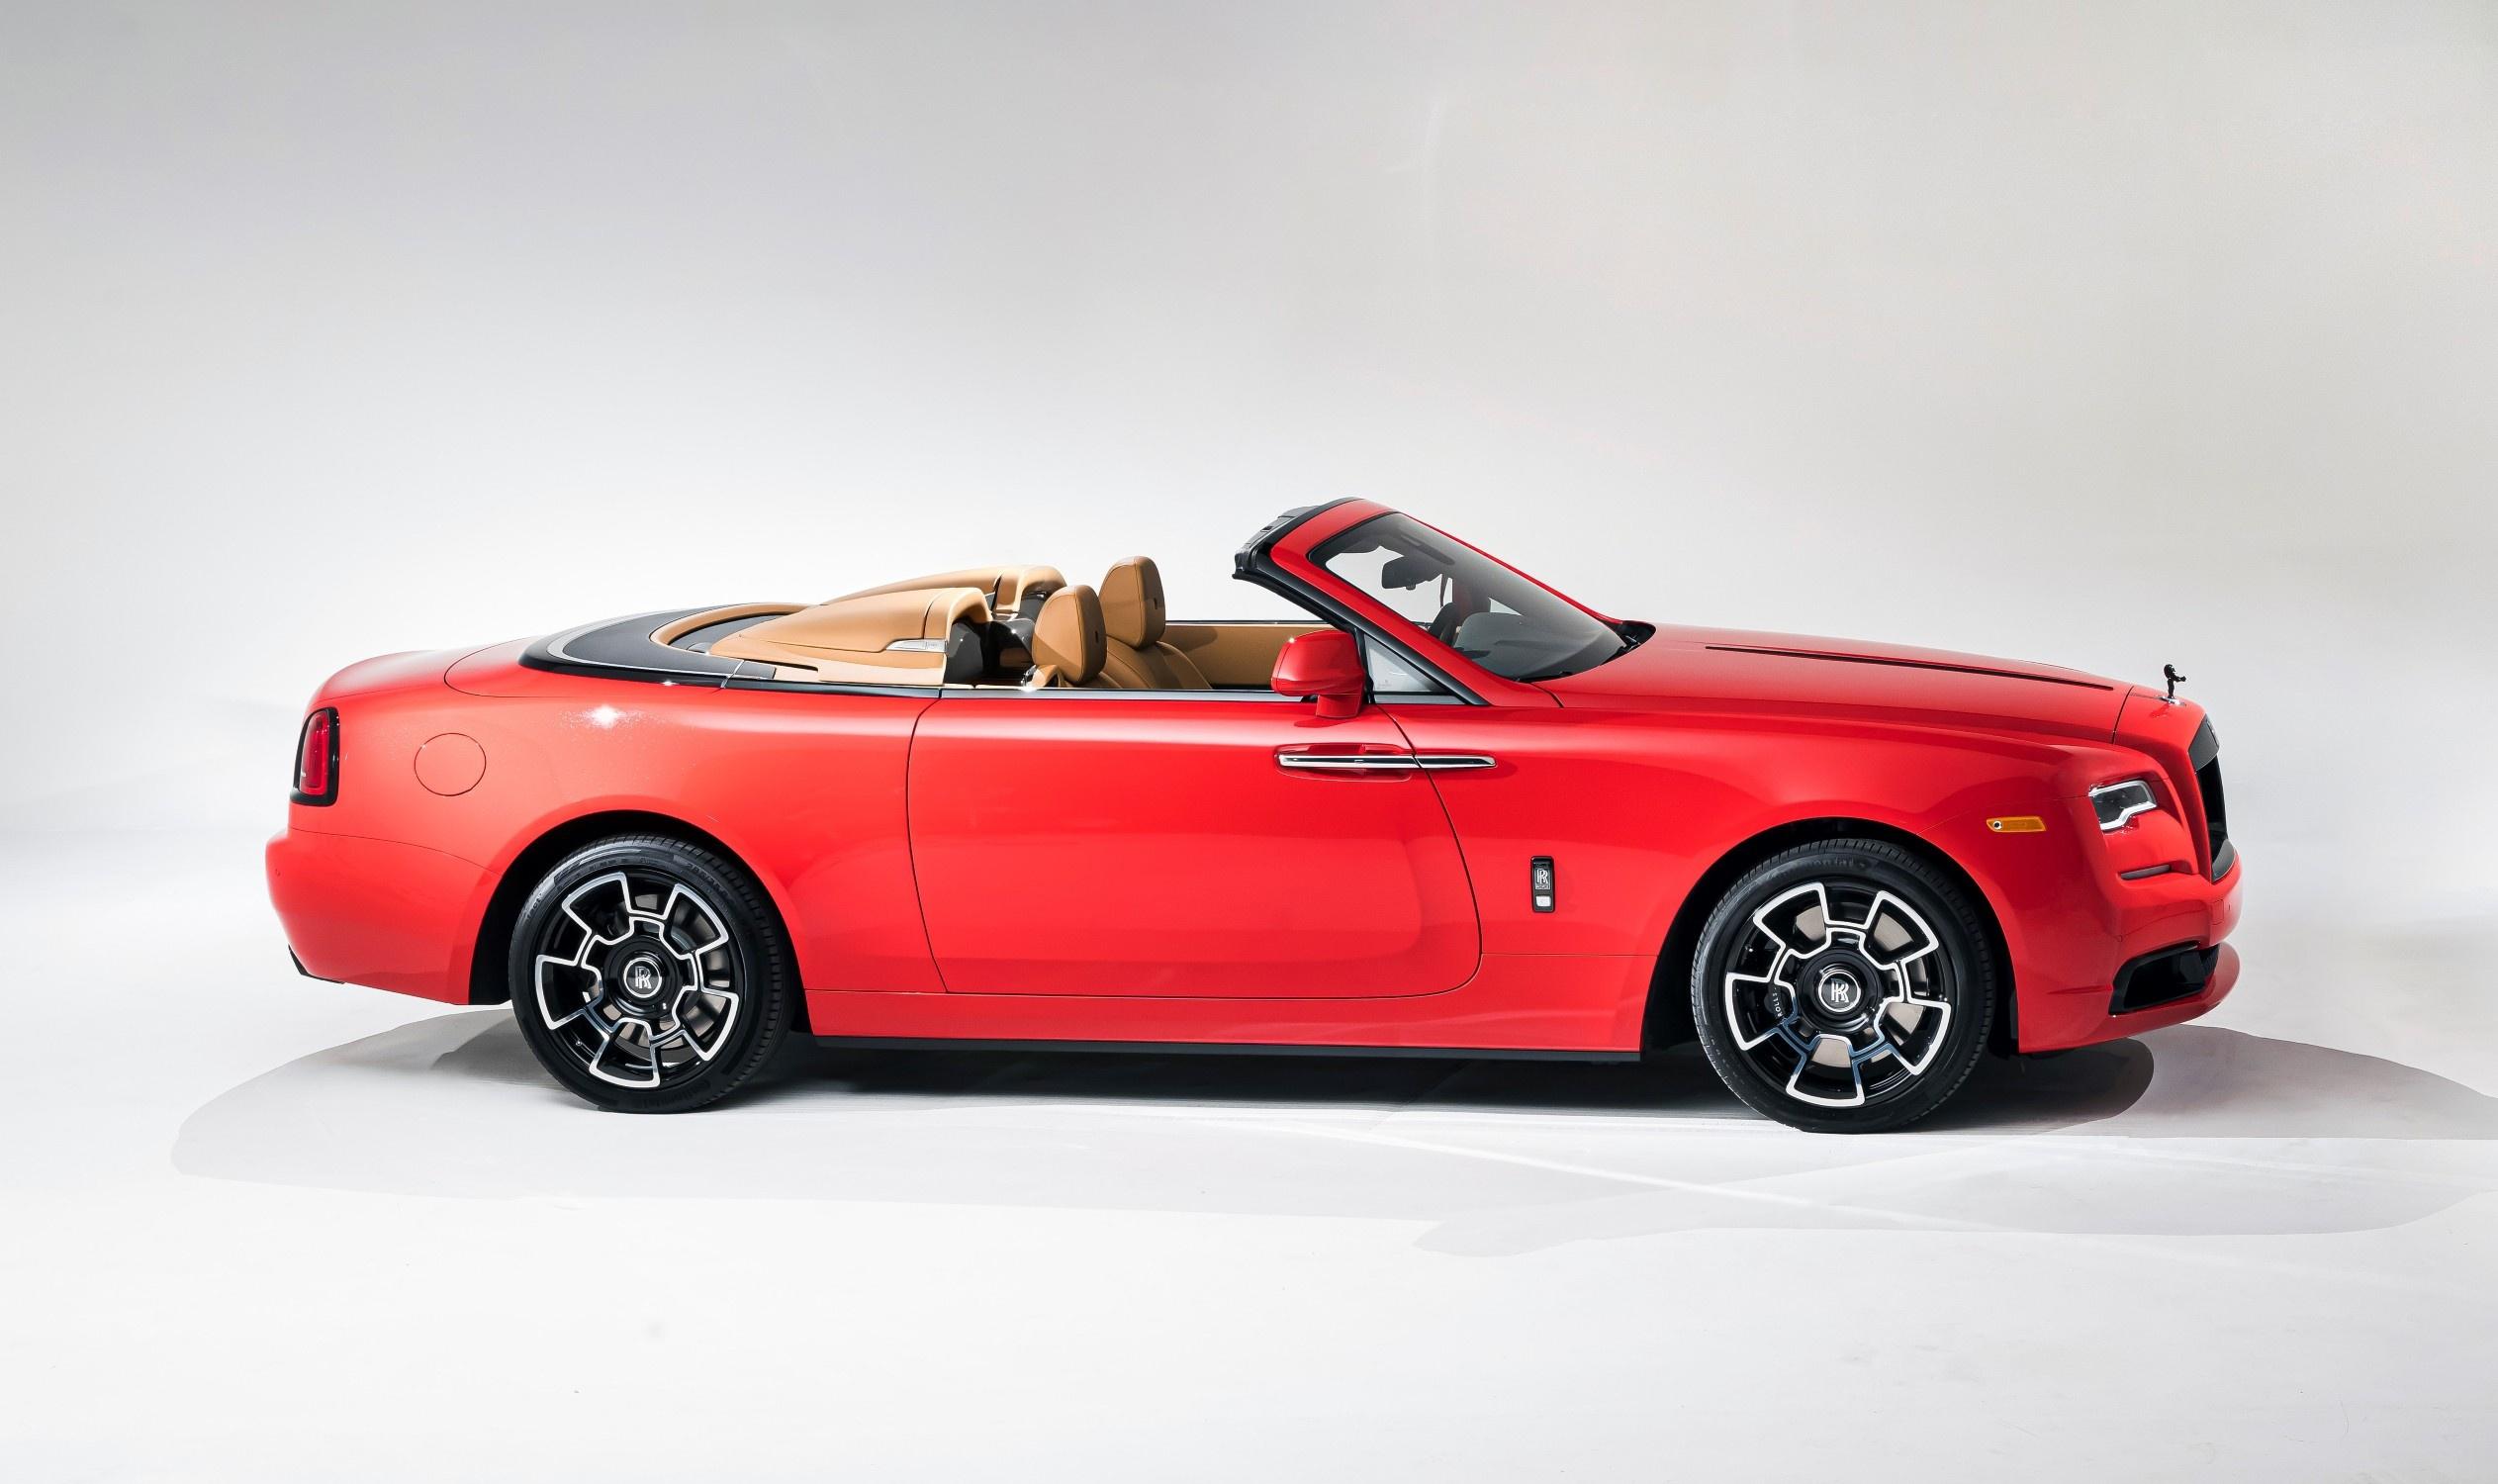 ban dac biet Rolls-Royce Phantom Tempus anh 12